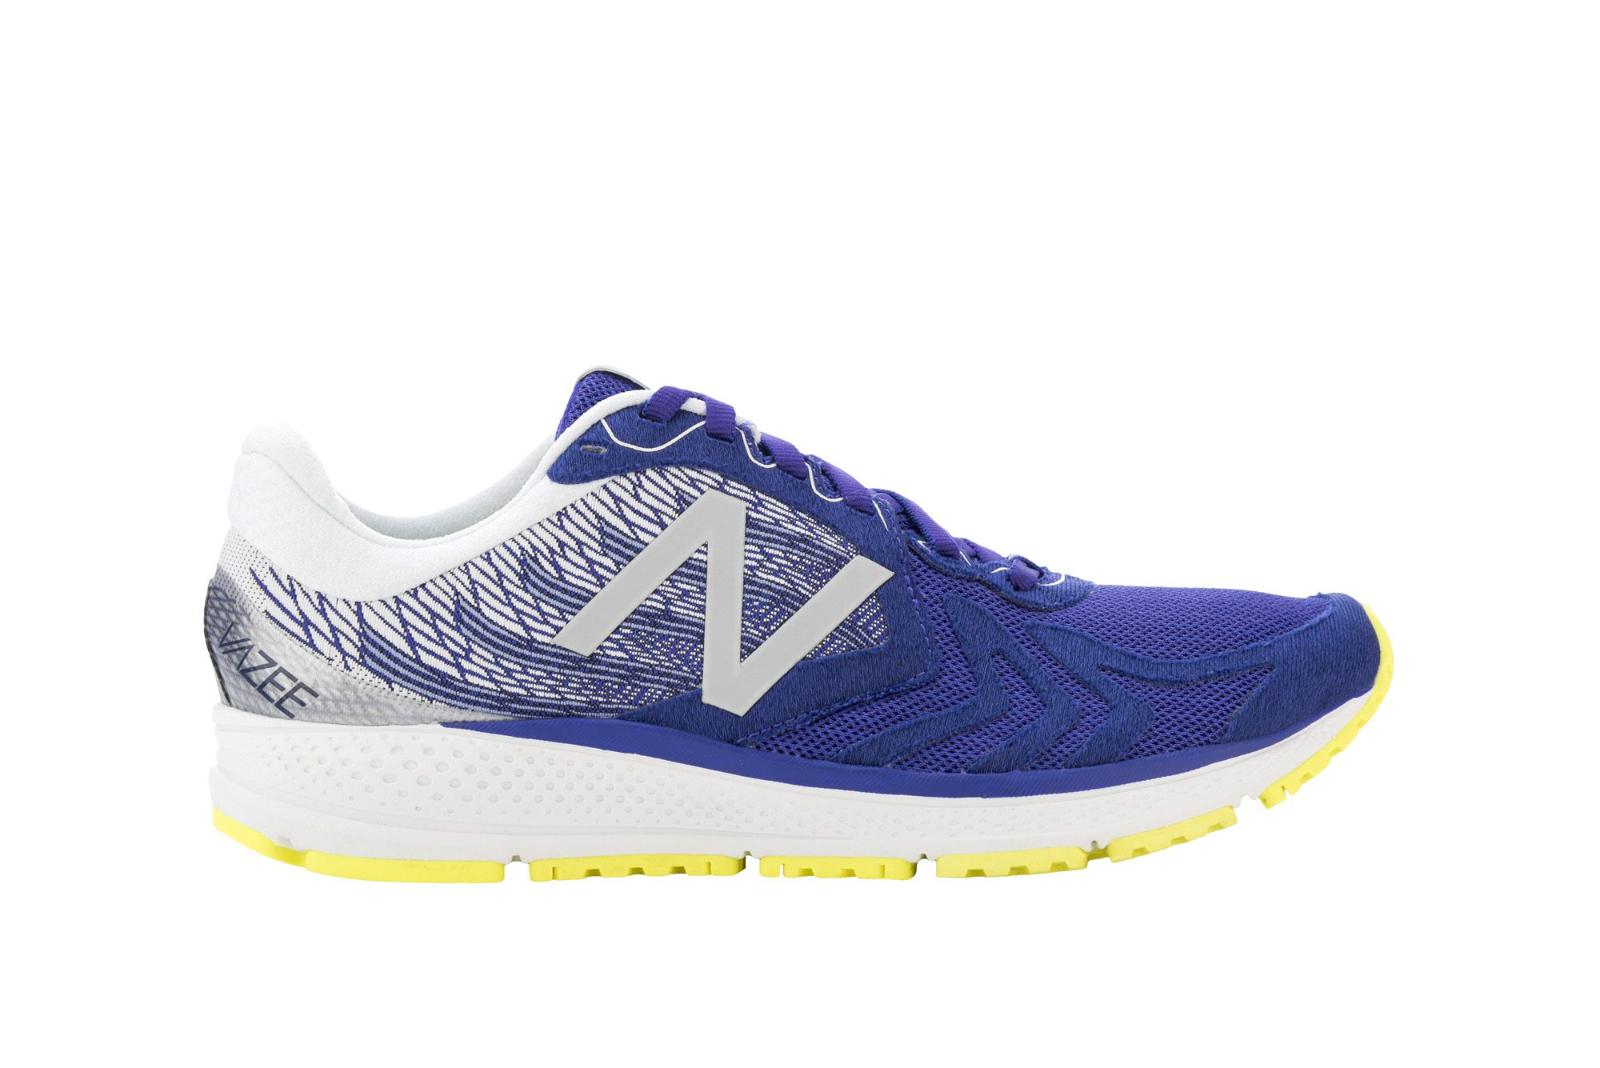 Donna  New Balance Vazee Pace V2 Run Run Run scarpe viola Dimensione 6.5  NGZRB-M400 84ecae